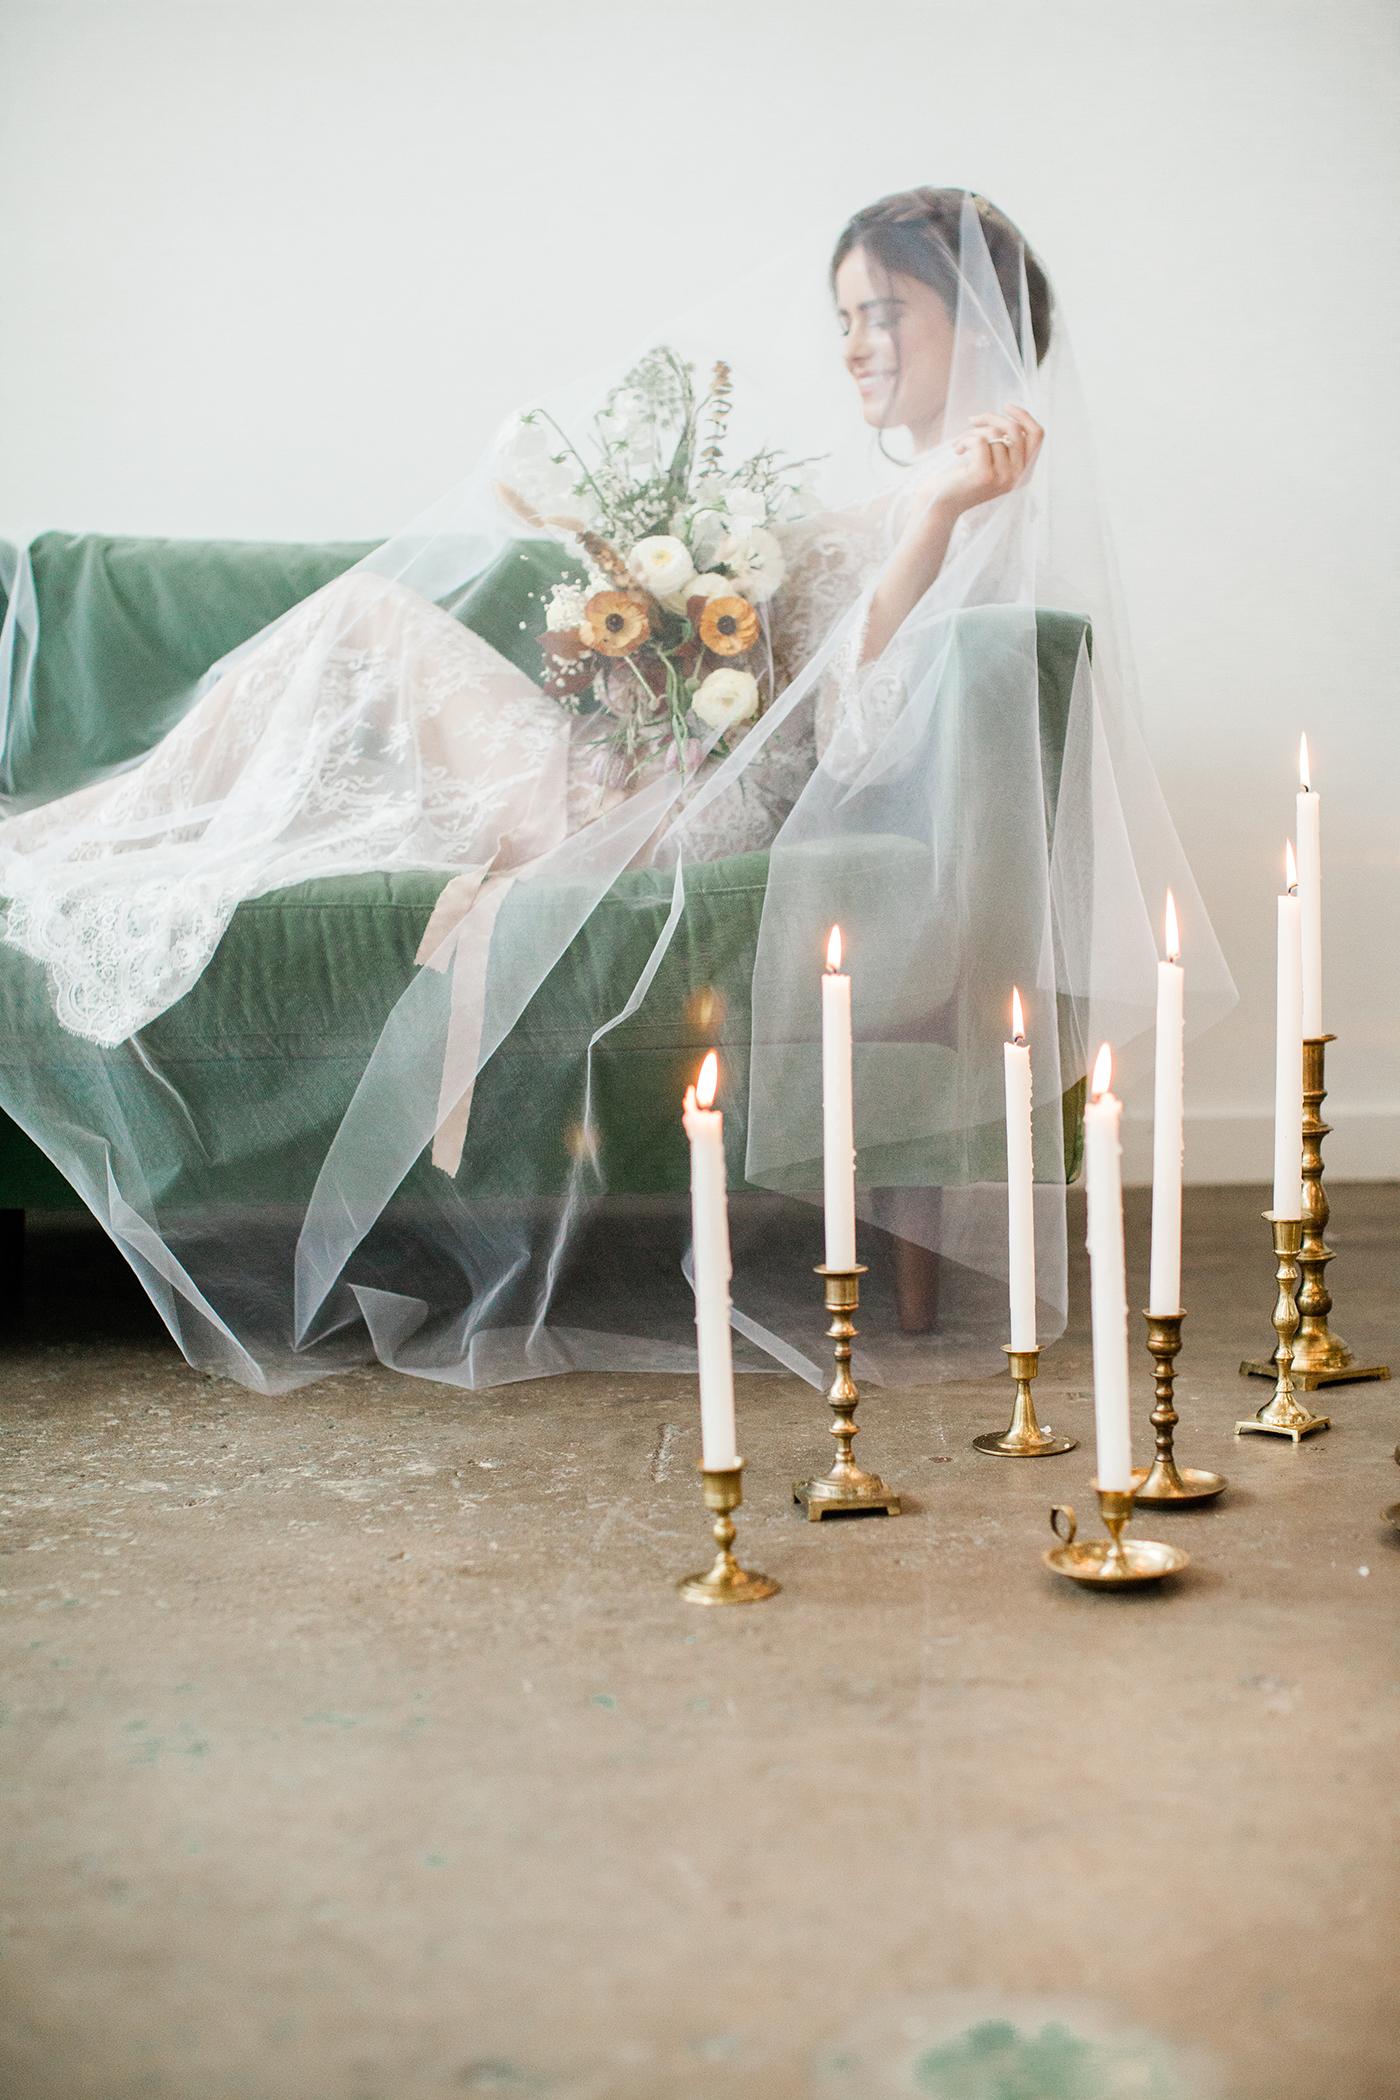 Wedding Floral Design Dallas - Olive Grove Design - Mimimalist Fall Wedding - 00141.jpg